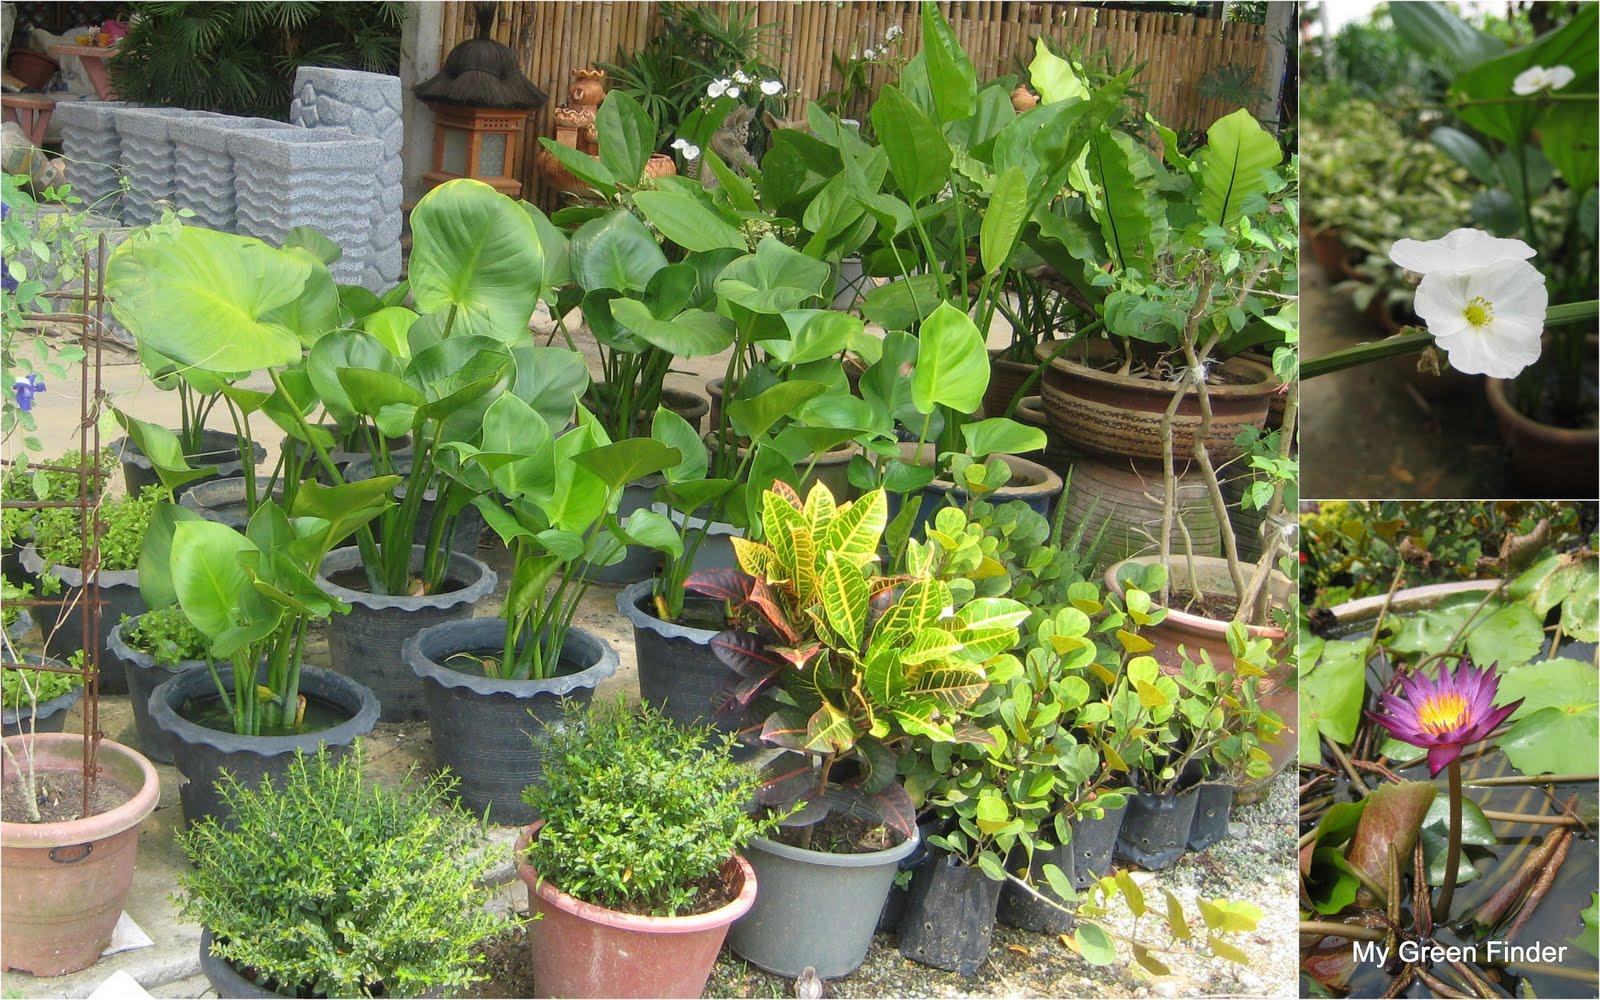 My Green Finder Plant Vendors Katsura Garden Water Feature Garden Mart